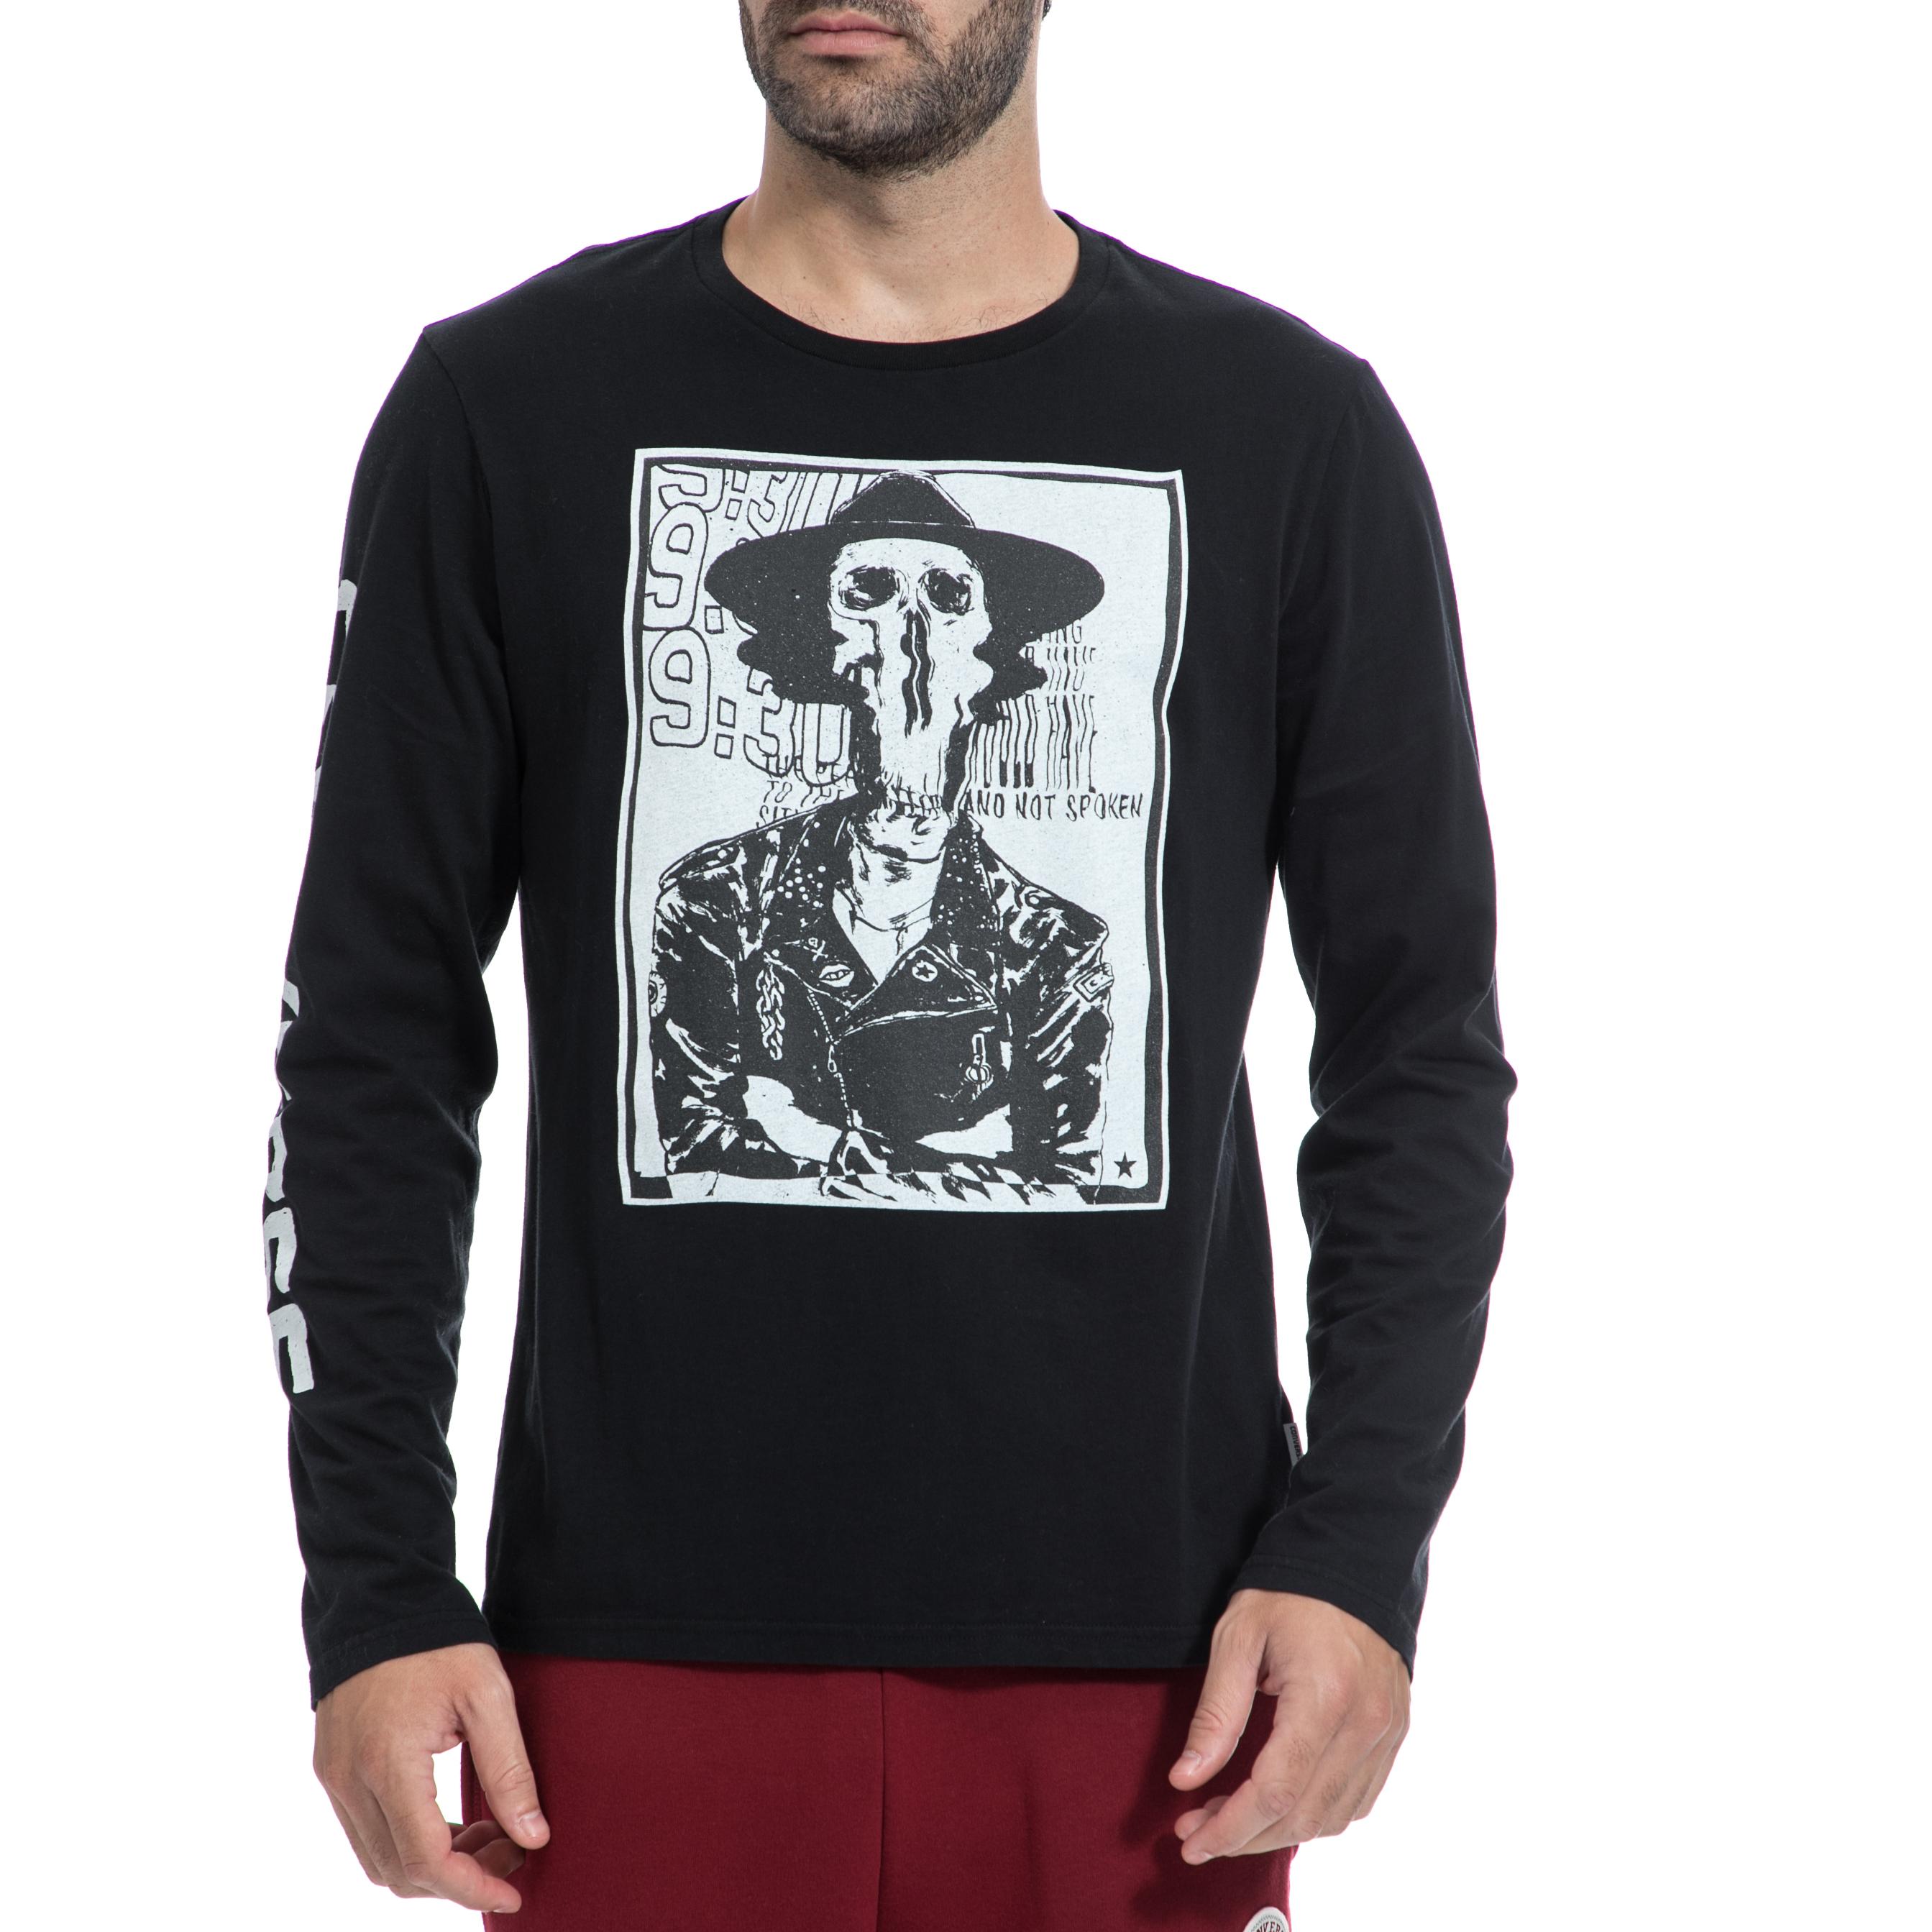 CONVERSE - Ανδρική μπλούζα CONVERSE μαύρη ανδρικά ρούχα αθλητικά φούτερ μακρυμάνικα